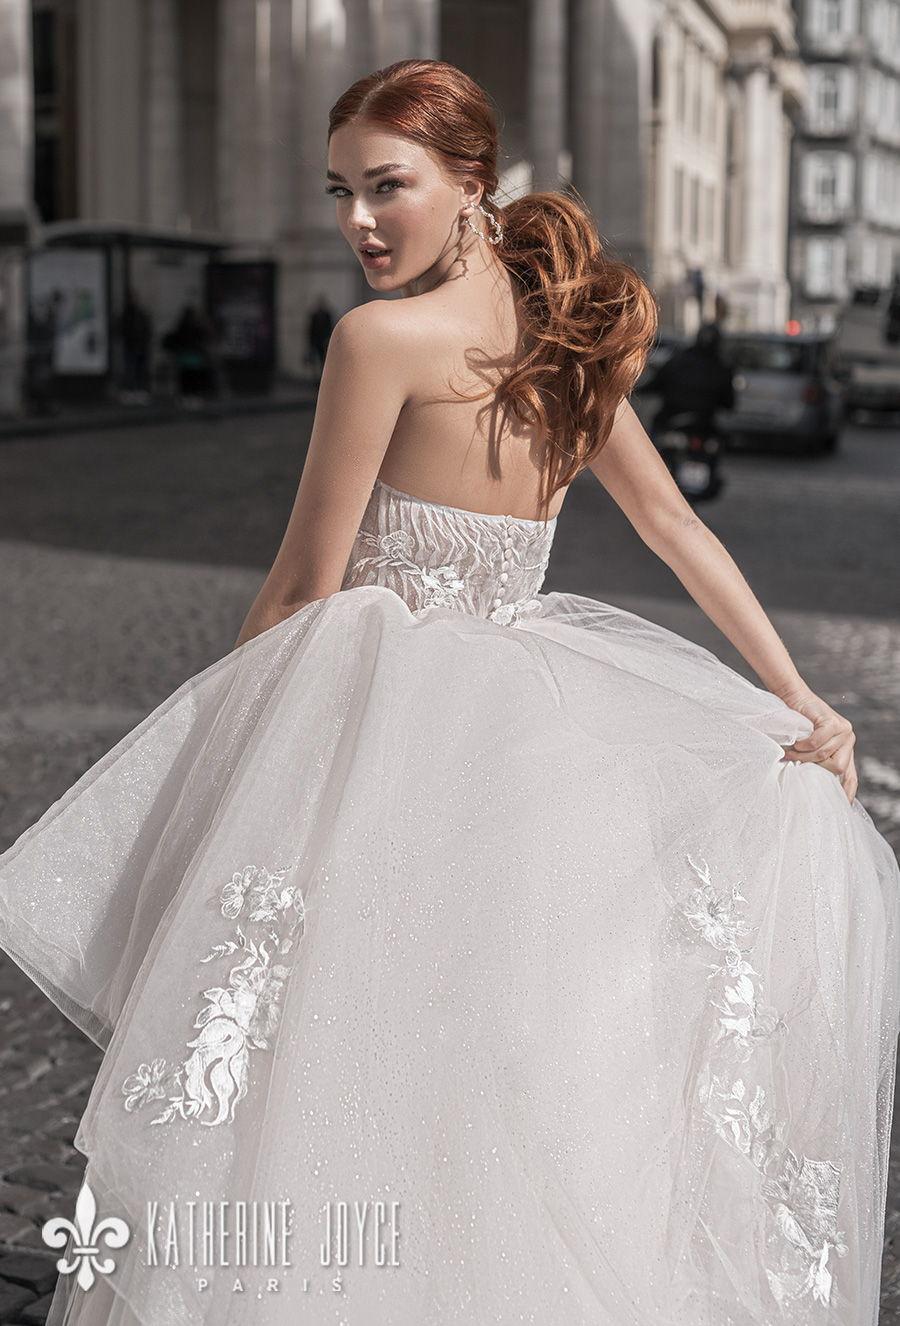 katherine joyce 2021 naples bridal off the shoulder half lantern sleeves sweetheart neckline heavily embellished bodice tiered skirt romantic a line wedding dress mid back (kaya) zbv